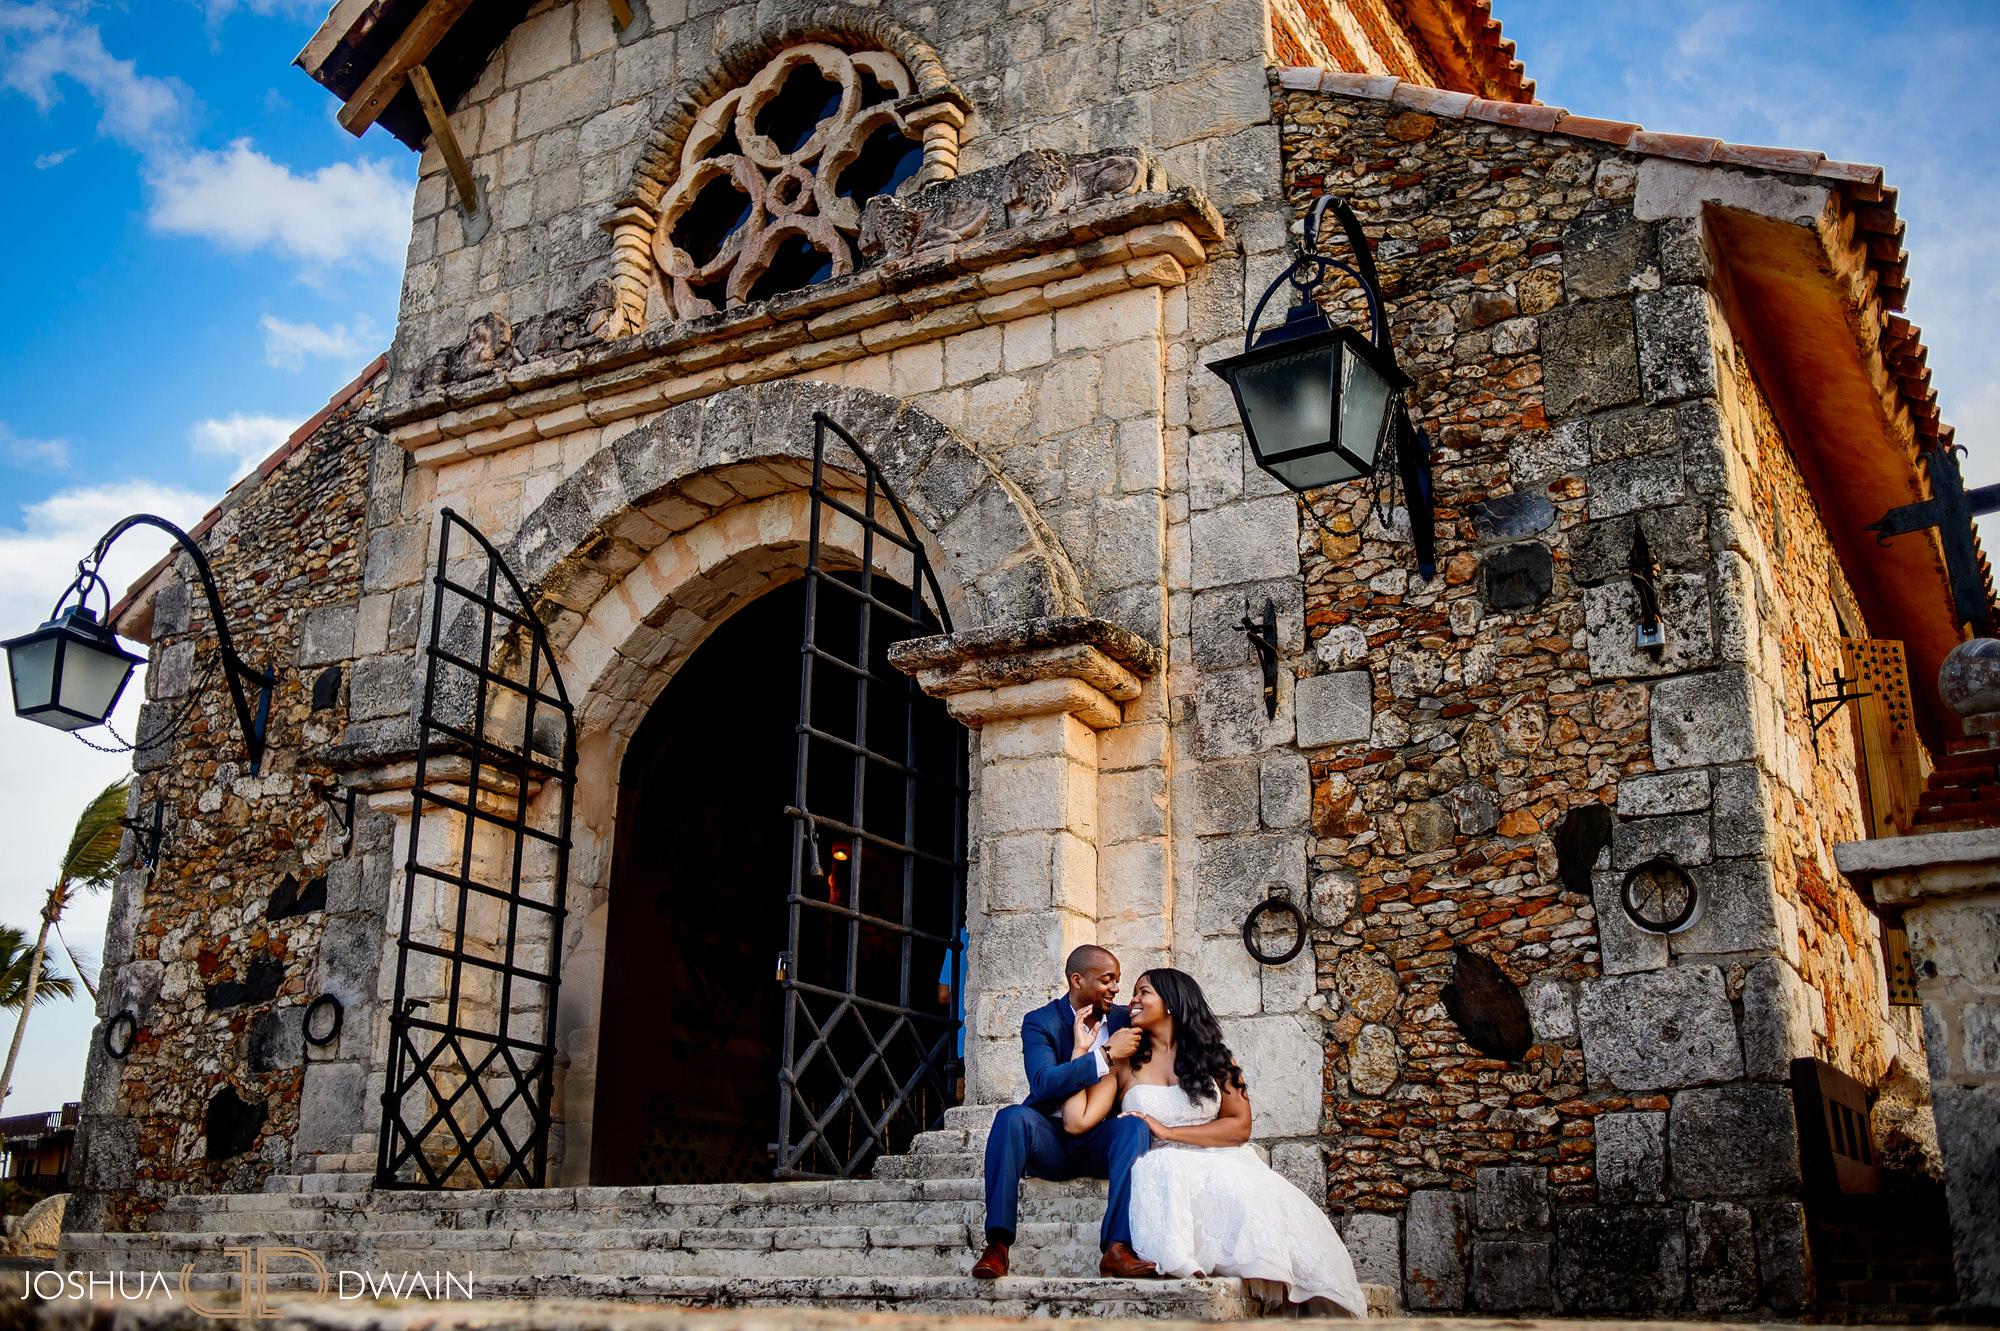 joshua-dwain-weddings-gallery-best-wedding-photographers-us-007